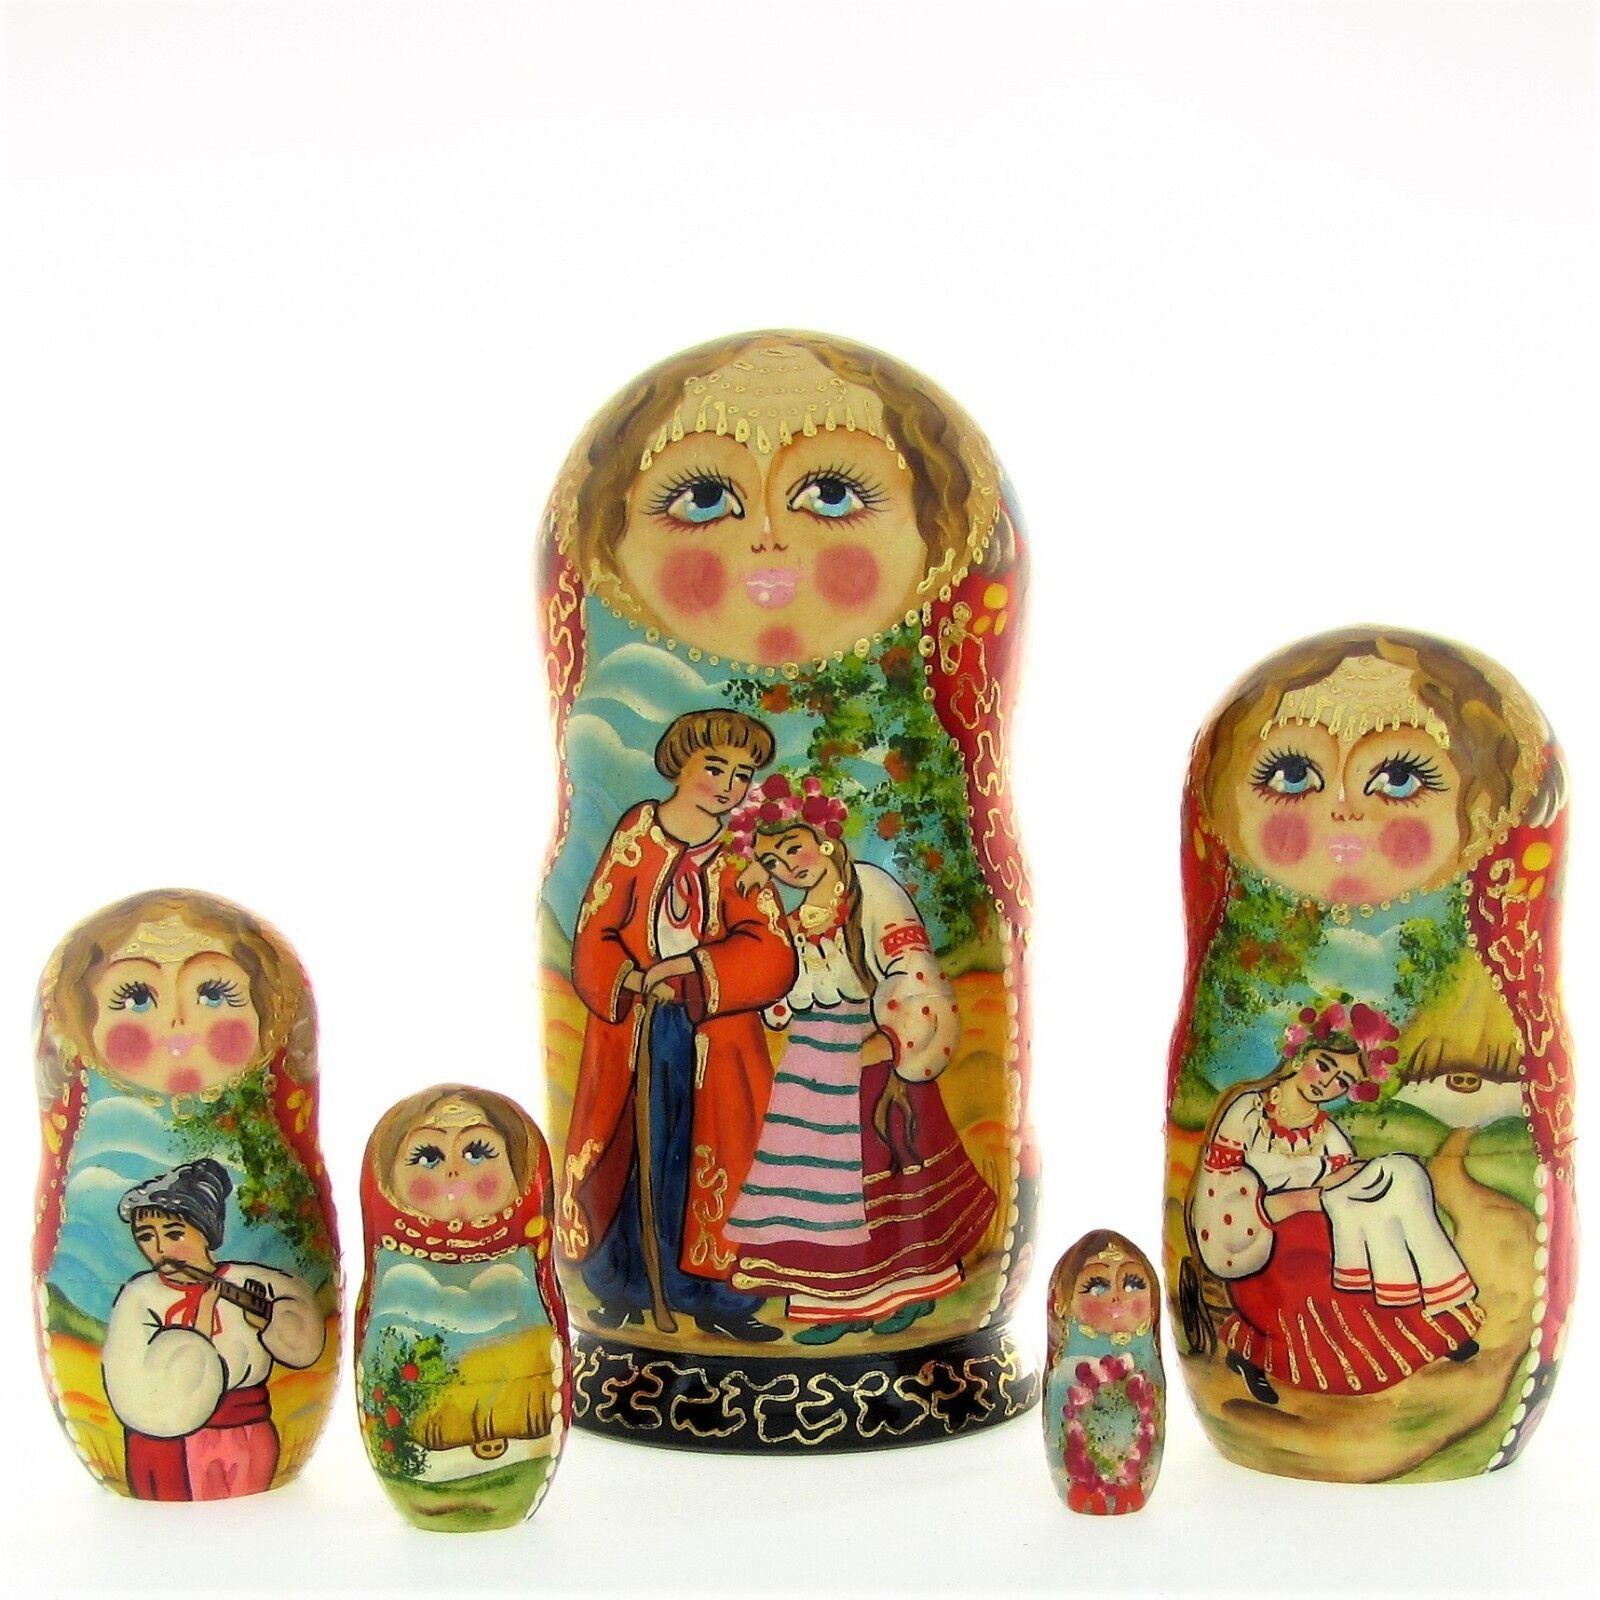 5 Poupées russes H18 peint main signé Matriochka Gigognes Nested Doll Matrioshka